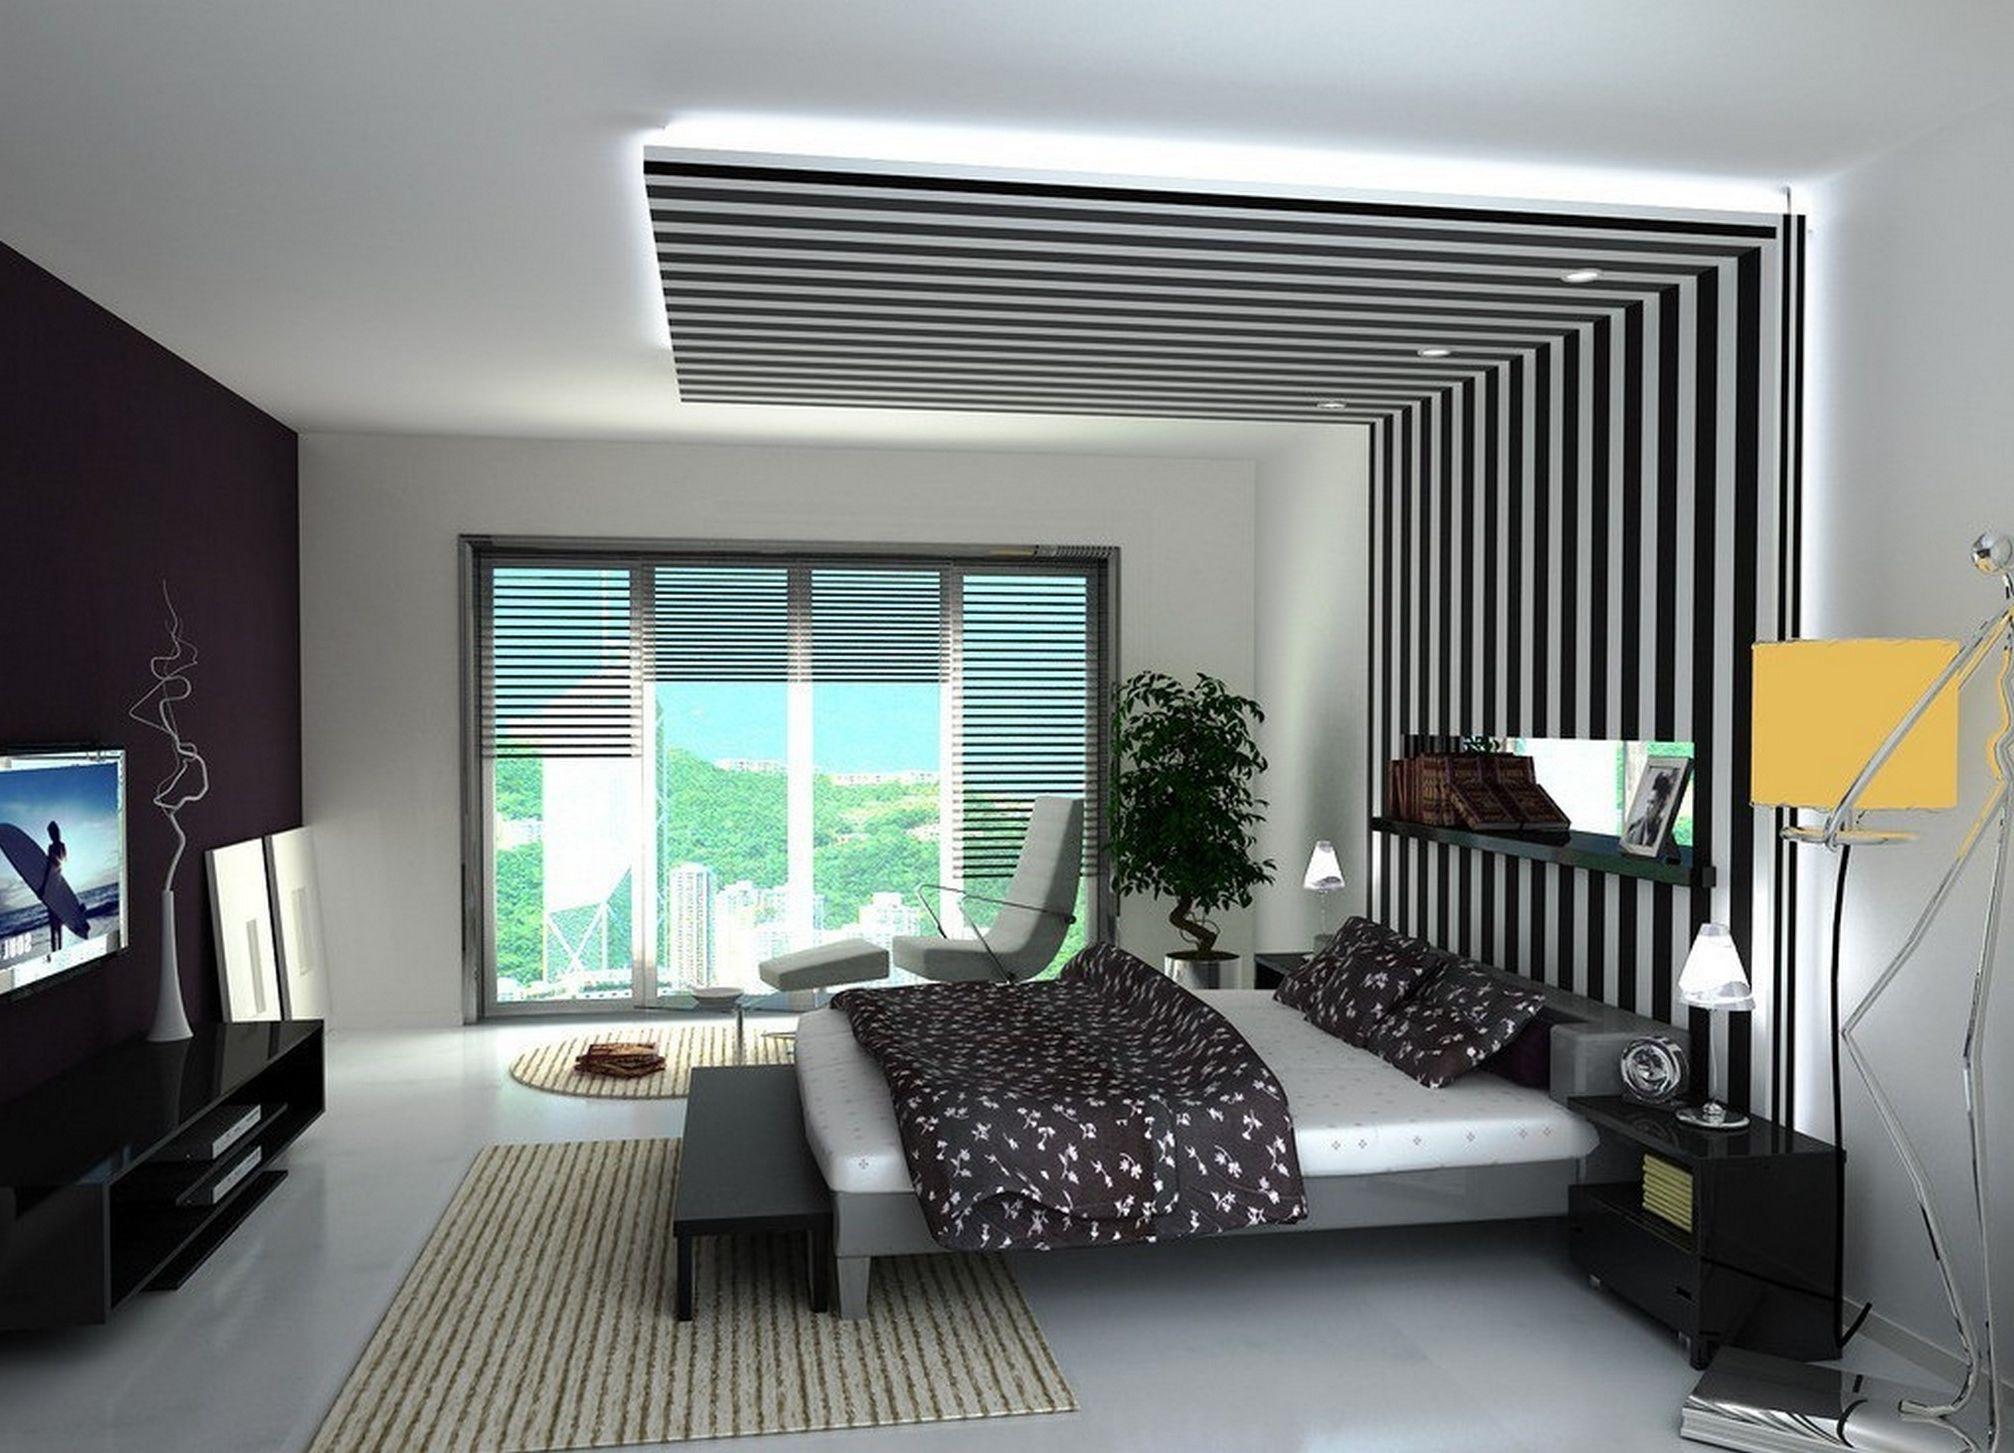 25 latest false designs for living room bed room youme - Fall ceiling design for living room ...